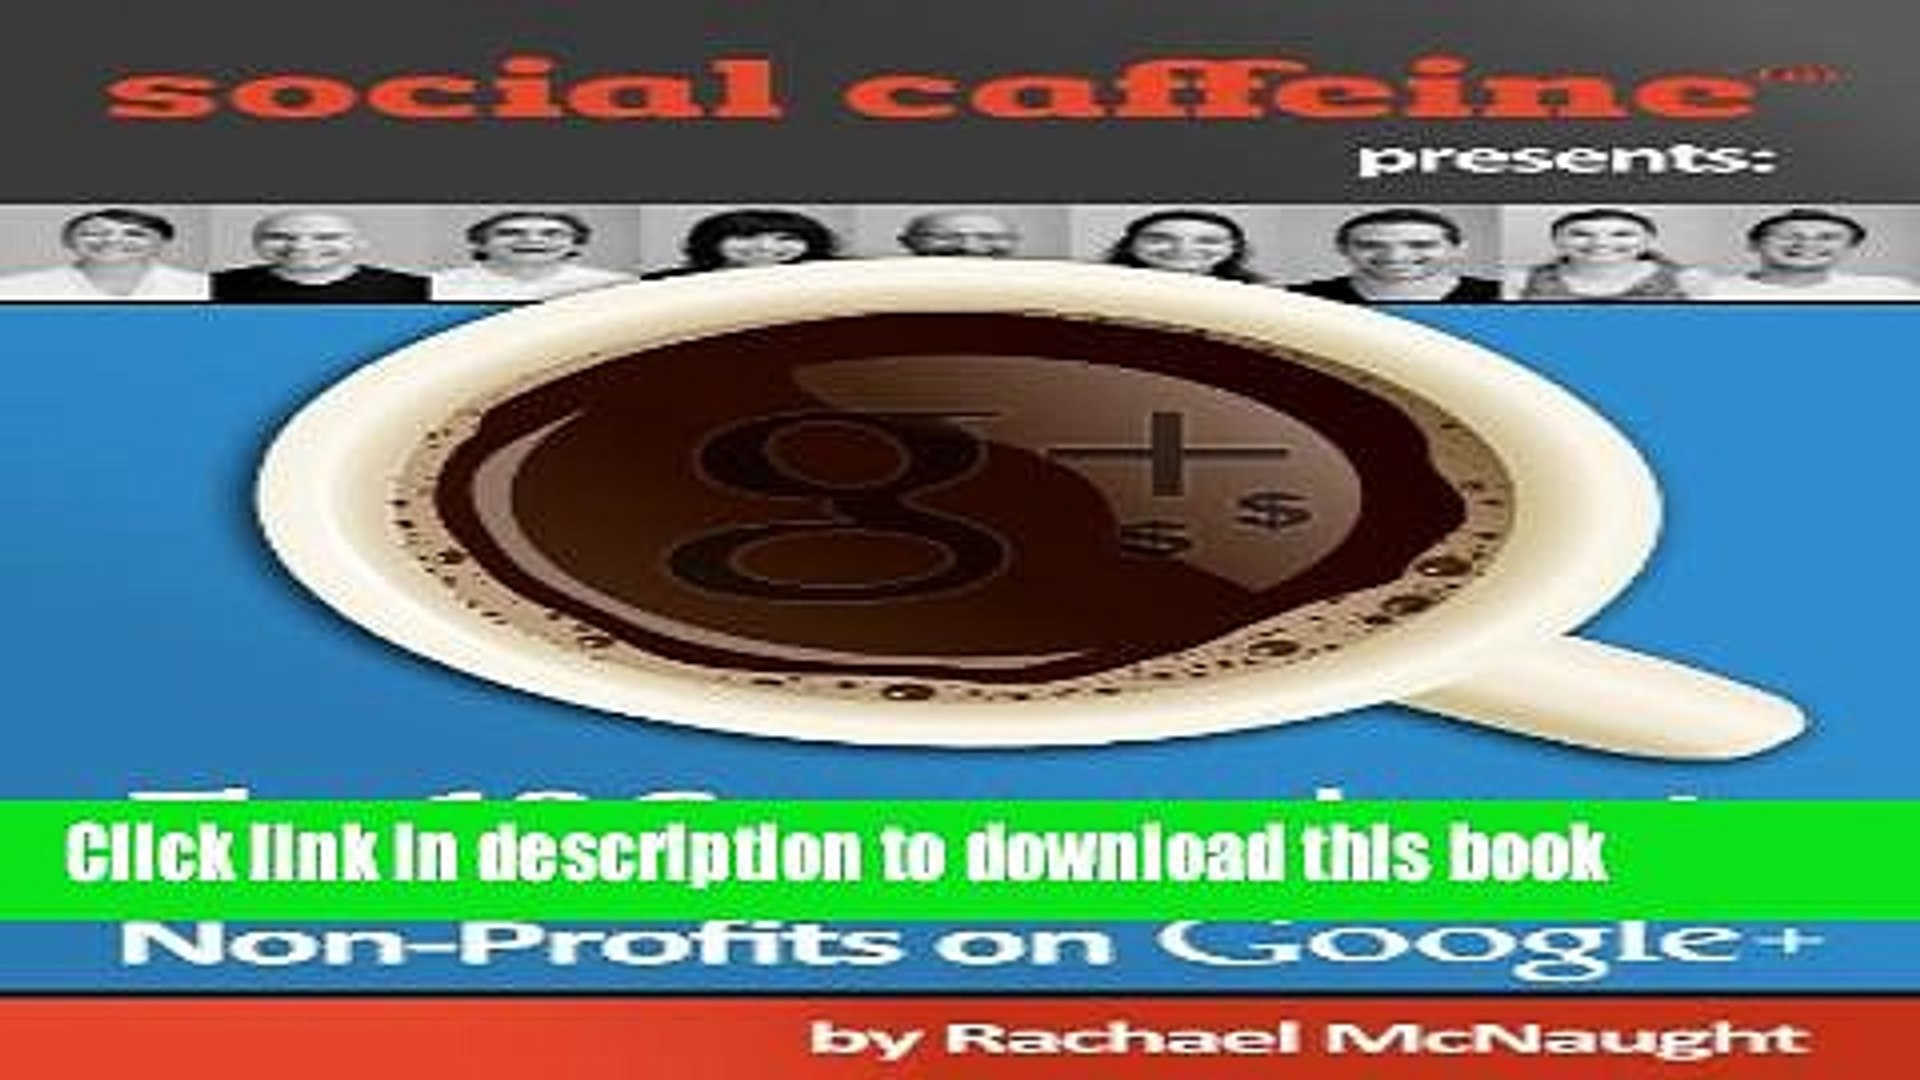 Read The 10 Commandments for Raising Money for Non-Profits on Google+ (Social Caffeine) Ebook Free